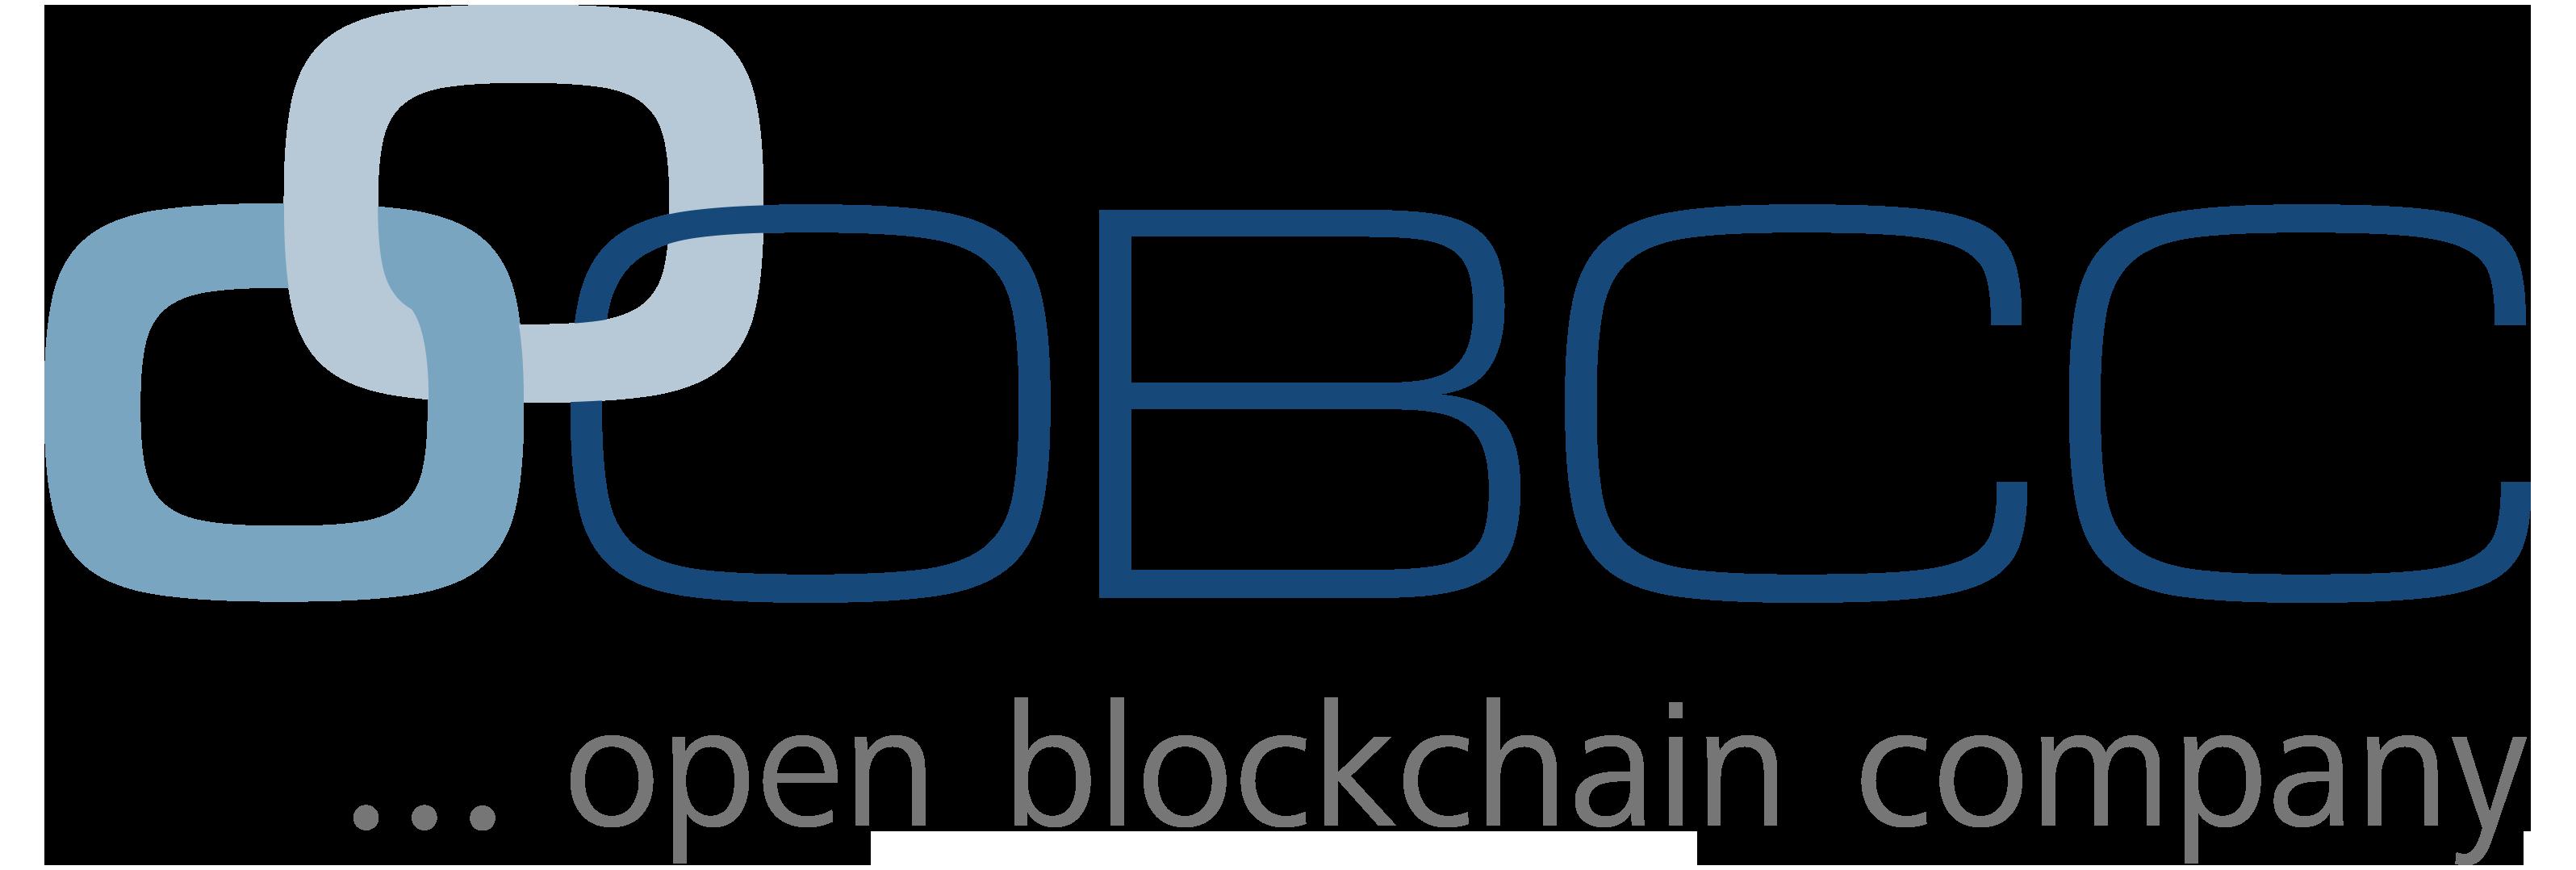 OB//CC - open blockchain company Logo